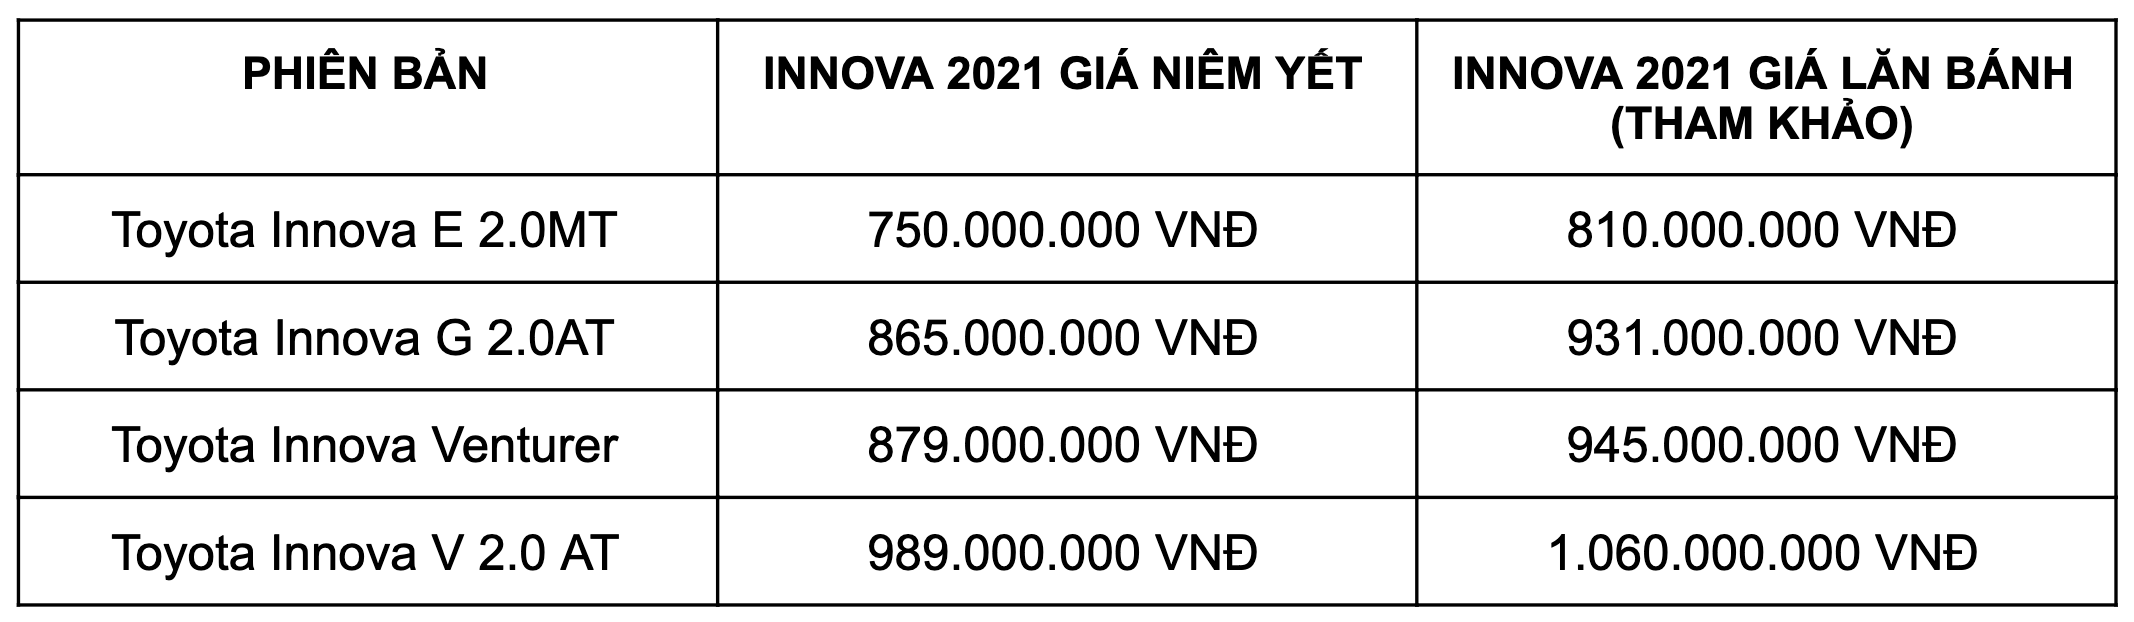 toyota innova 2021 giá lăn bánh